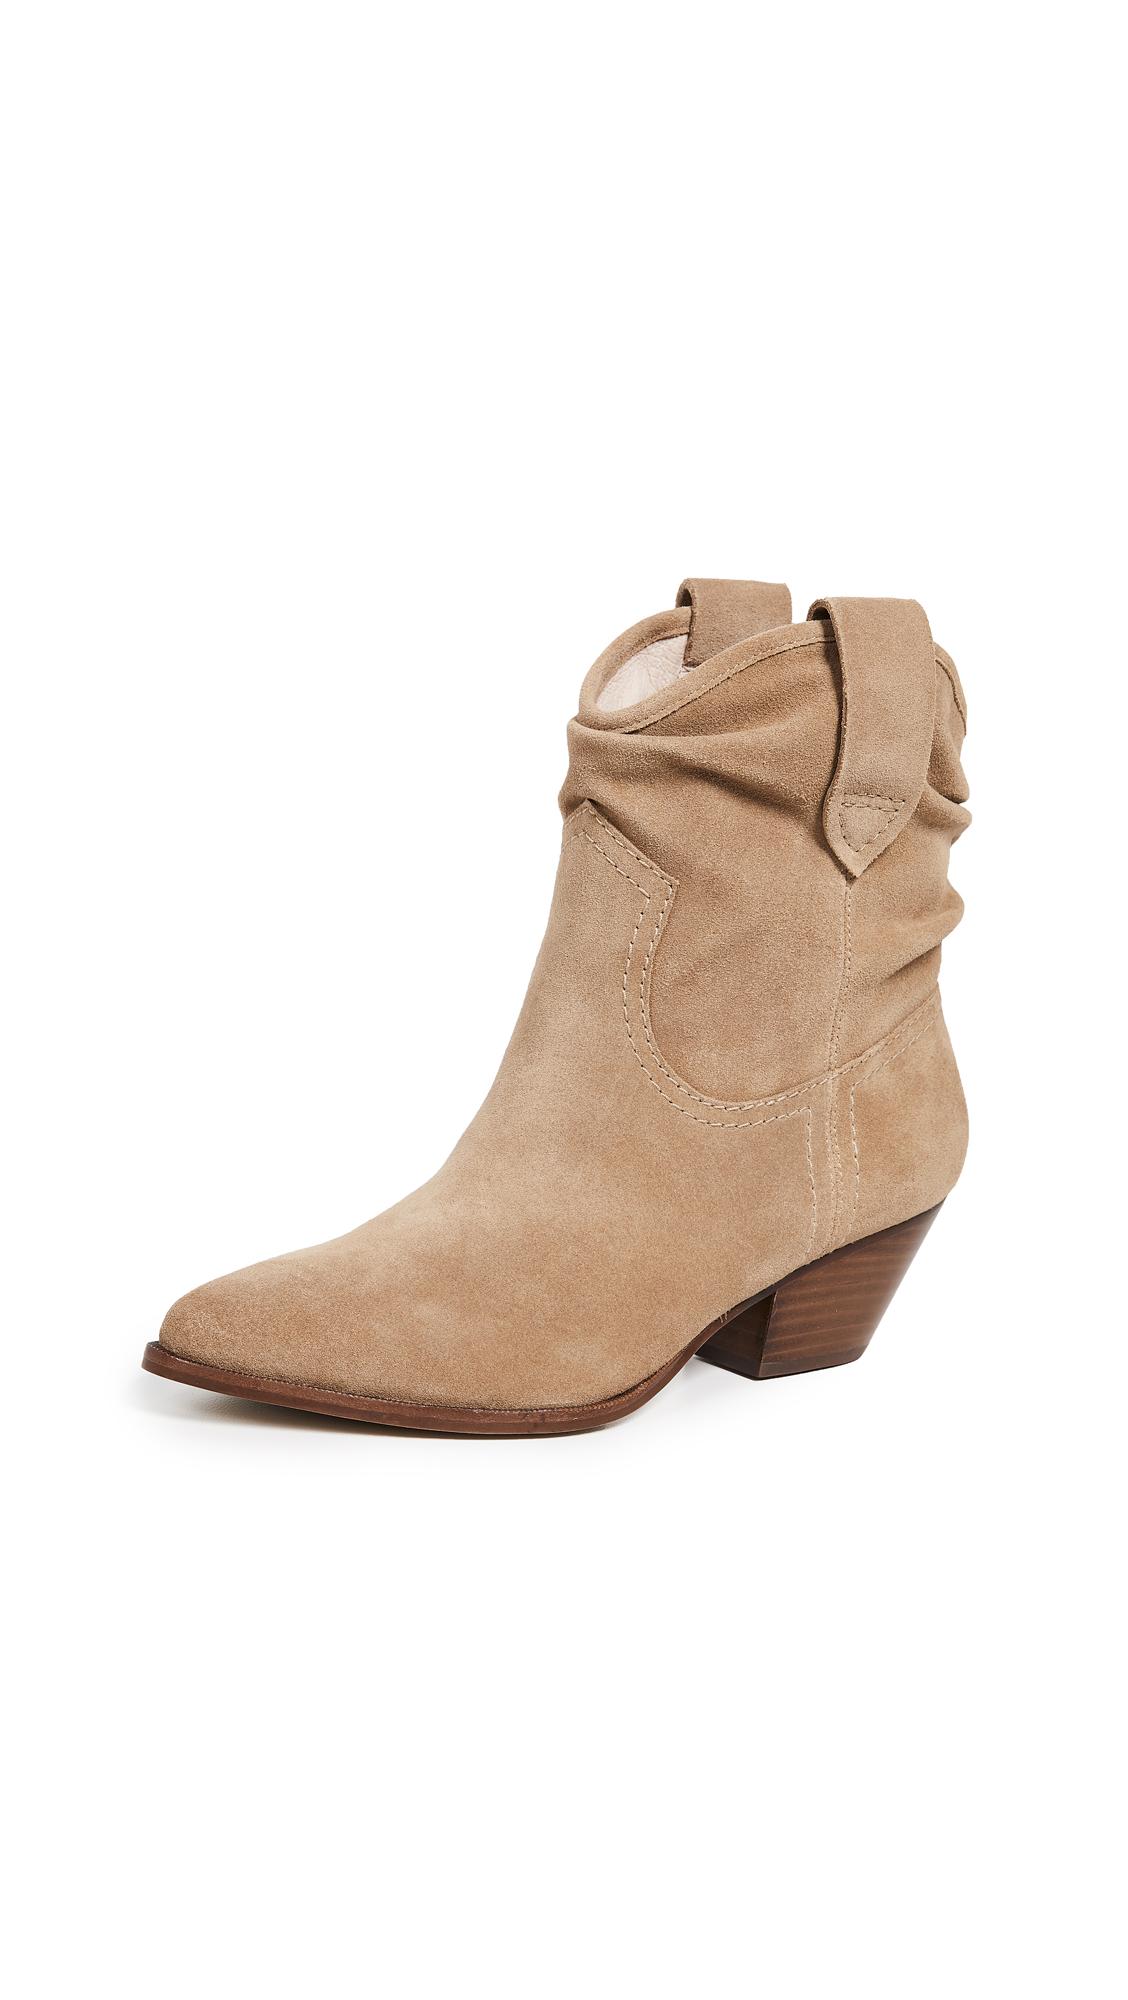 Rachel Zoe Clay Western Boots - Camel